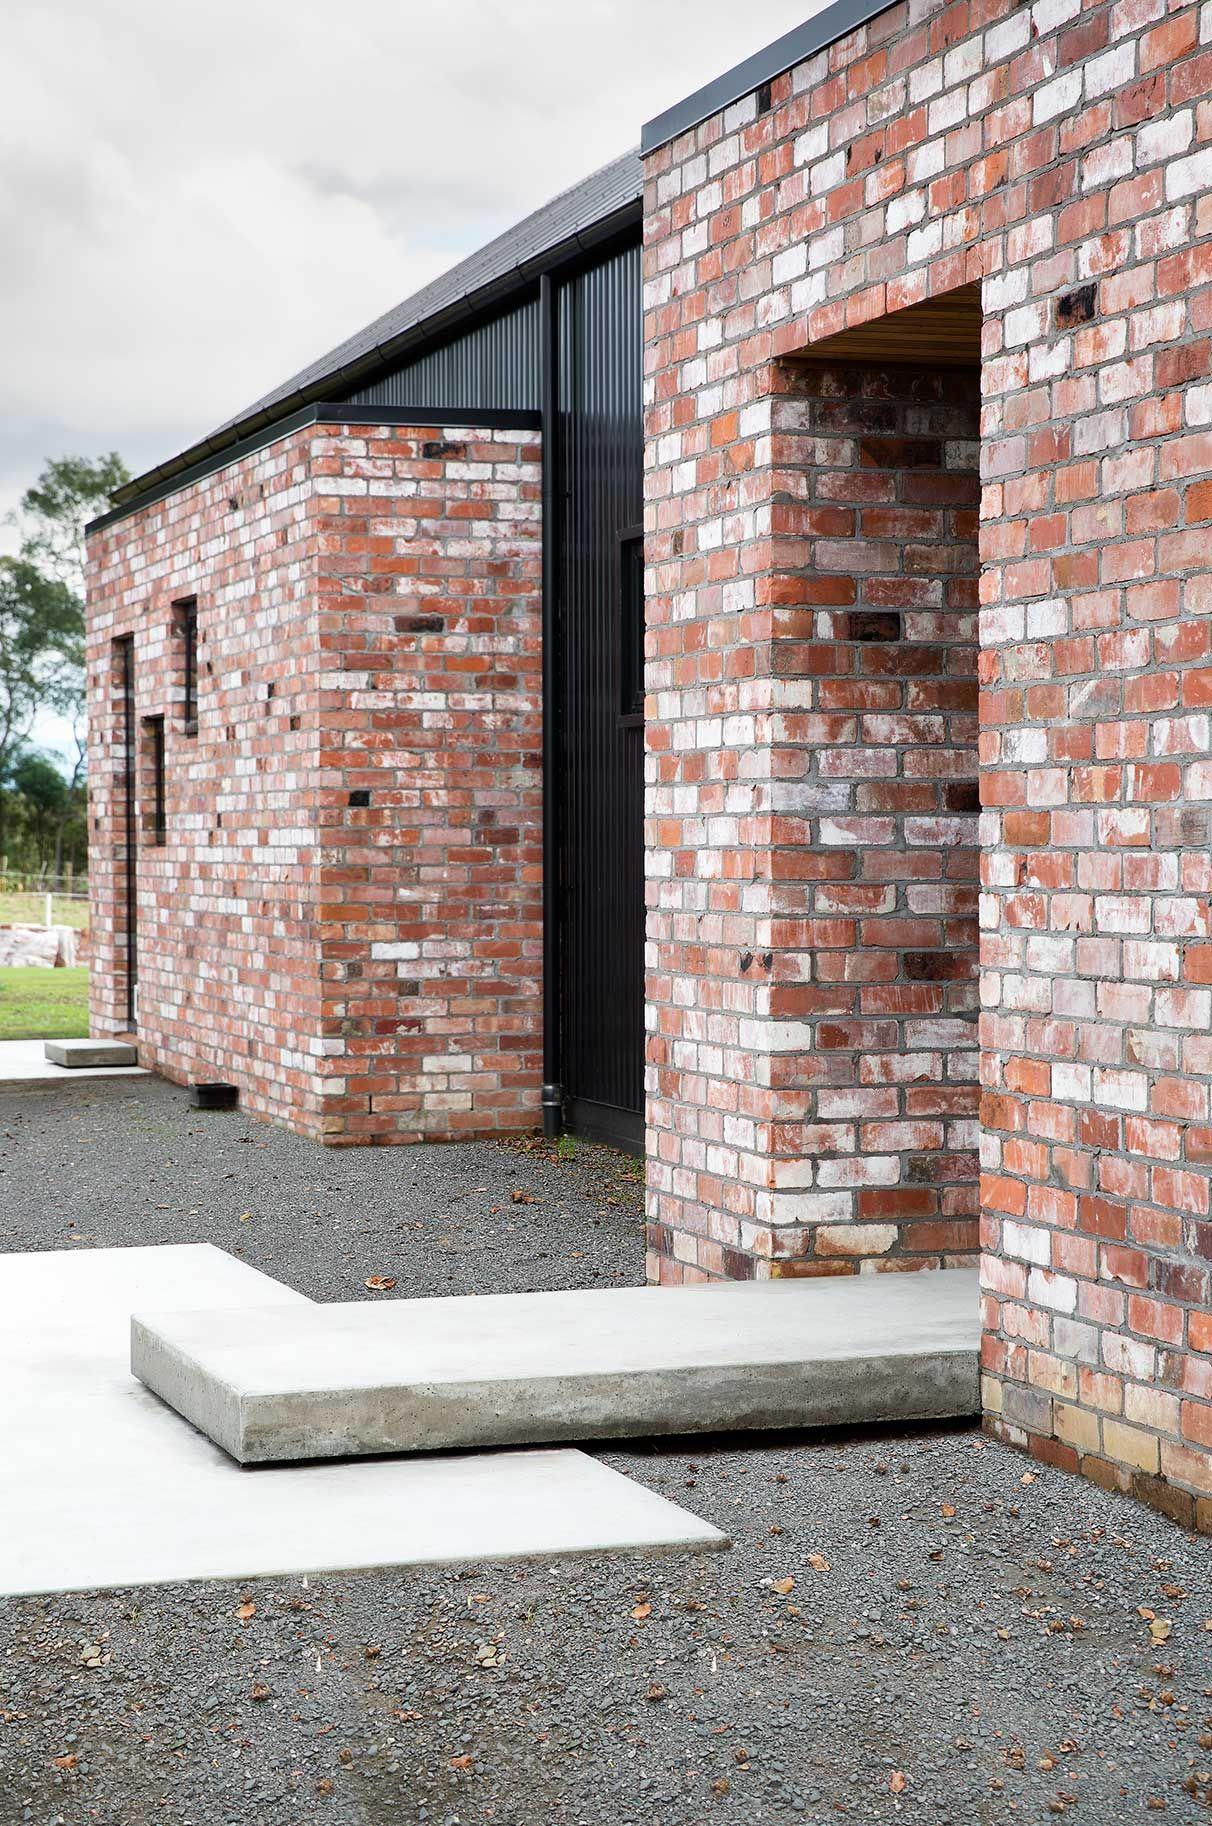 Modern Barn Form | Red Architecture | น้ำขุมรีสอร์ท | Pinterest ...